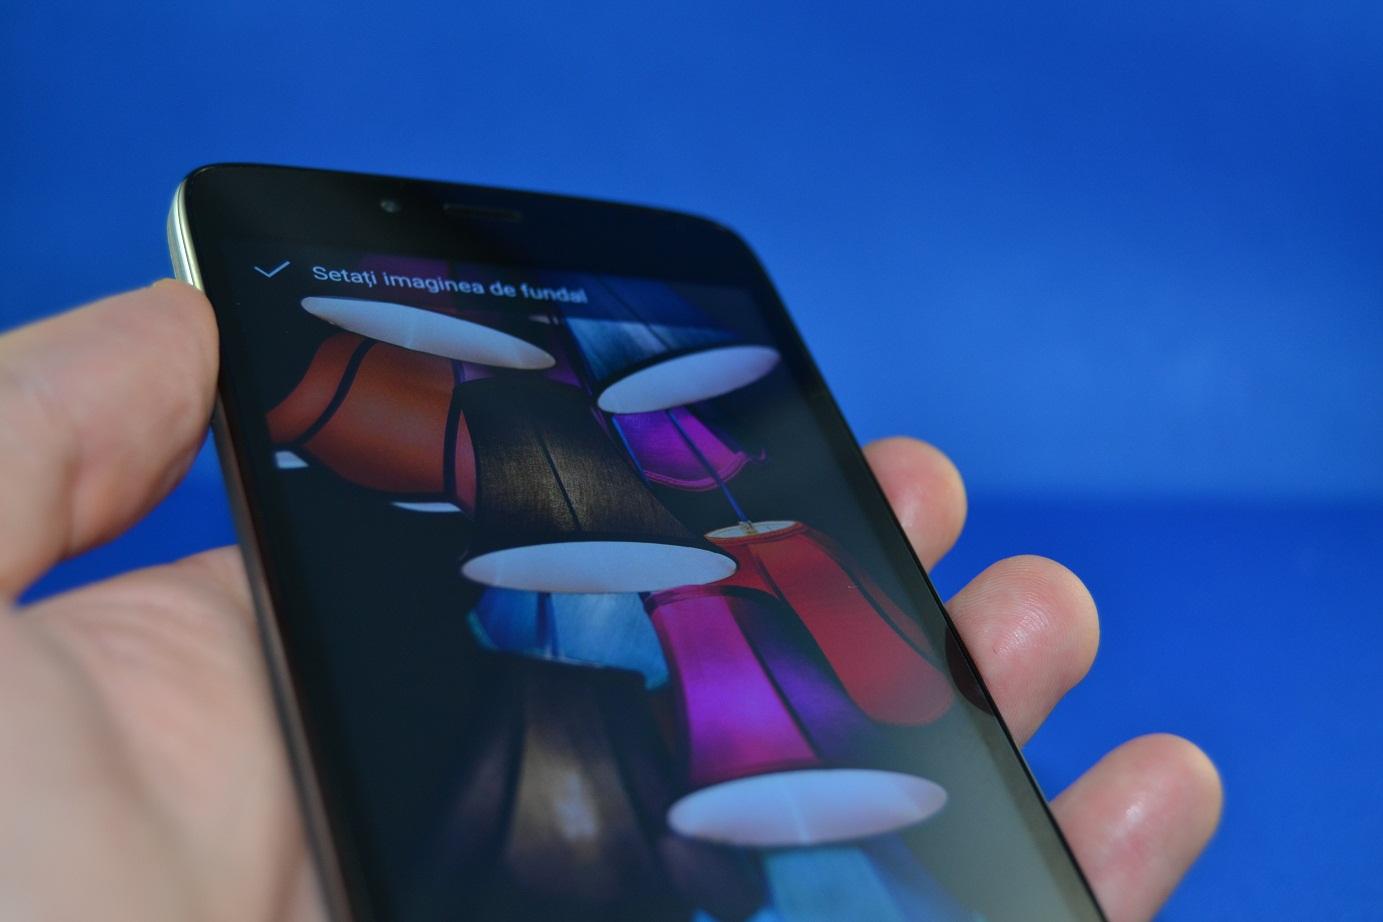 DSC_0207 Cateva pareri despre telefoanele Doogee si un sondaj! Aveti incredere in brandurile din CHINA?